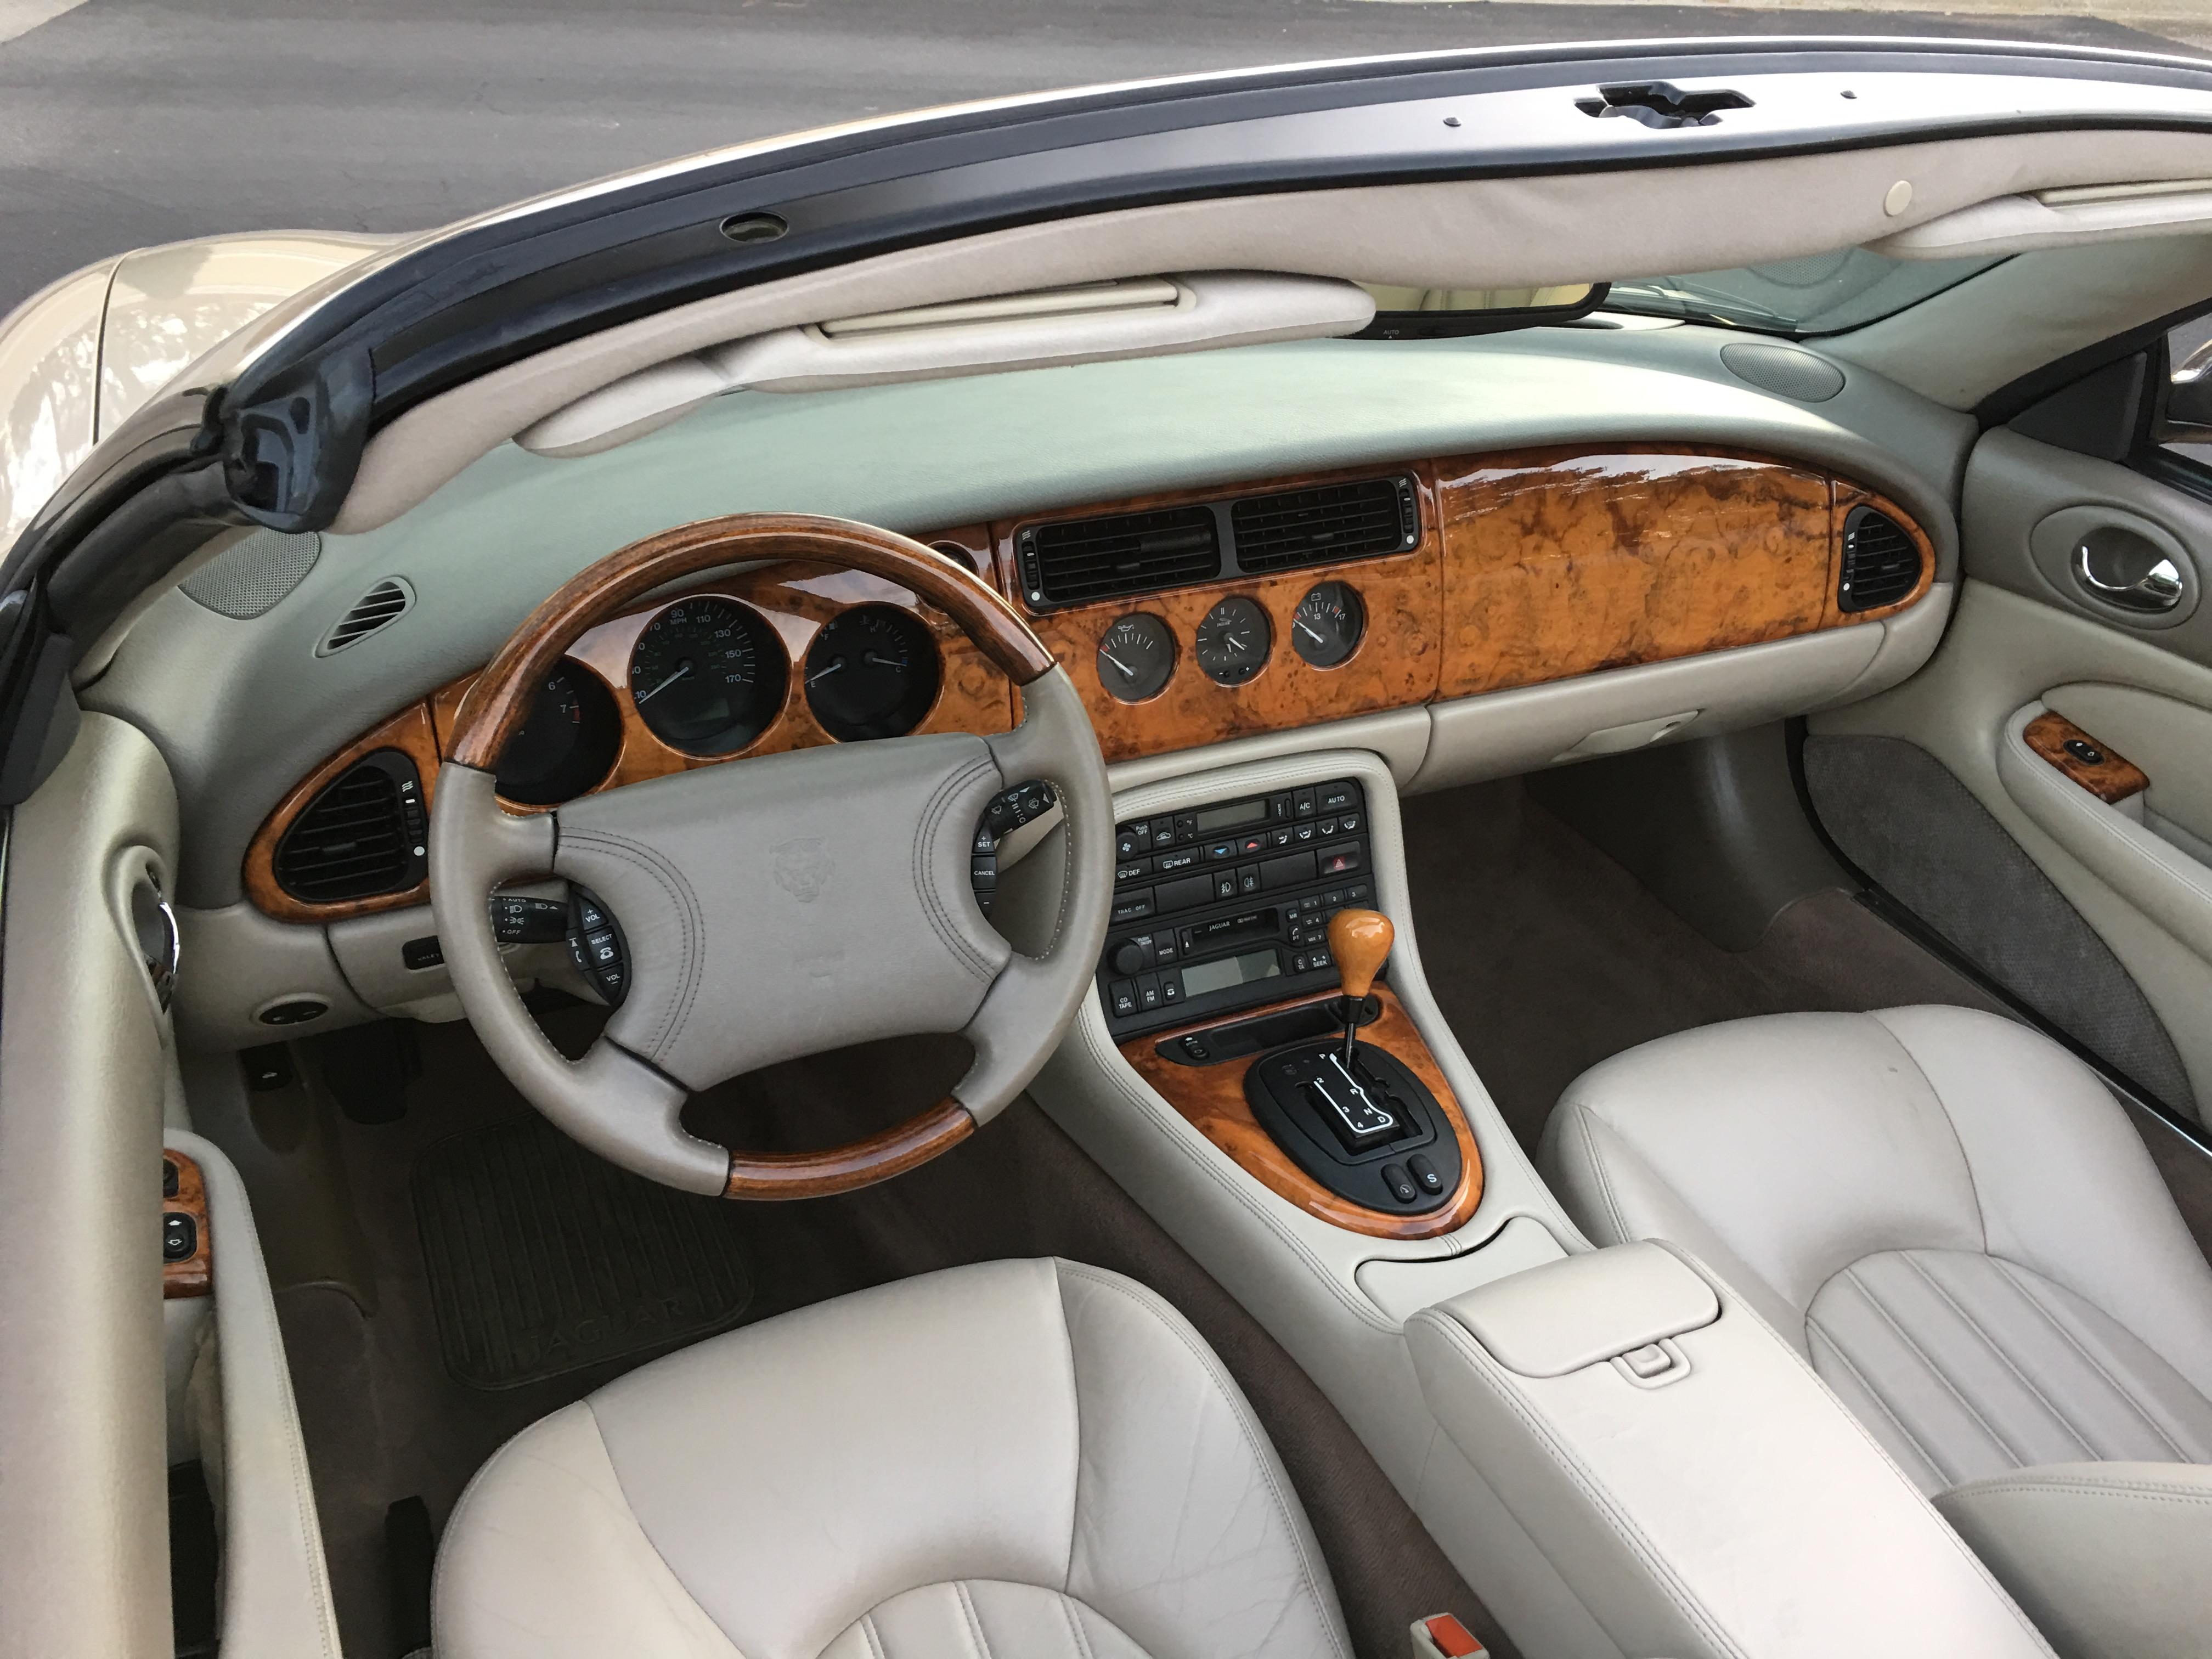 latch metric top convertible conversion manual manuallatch htm jaguar